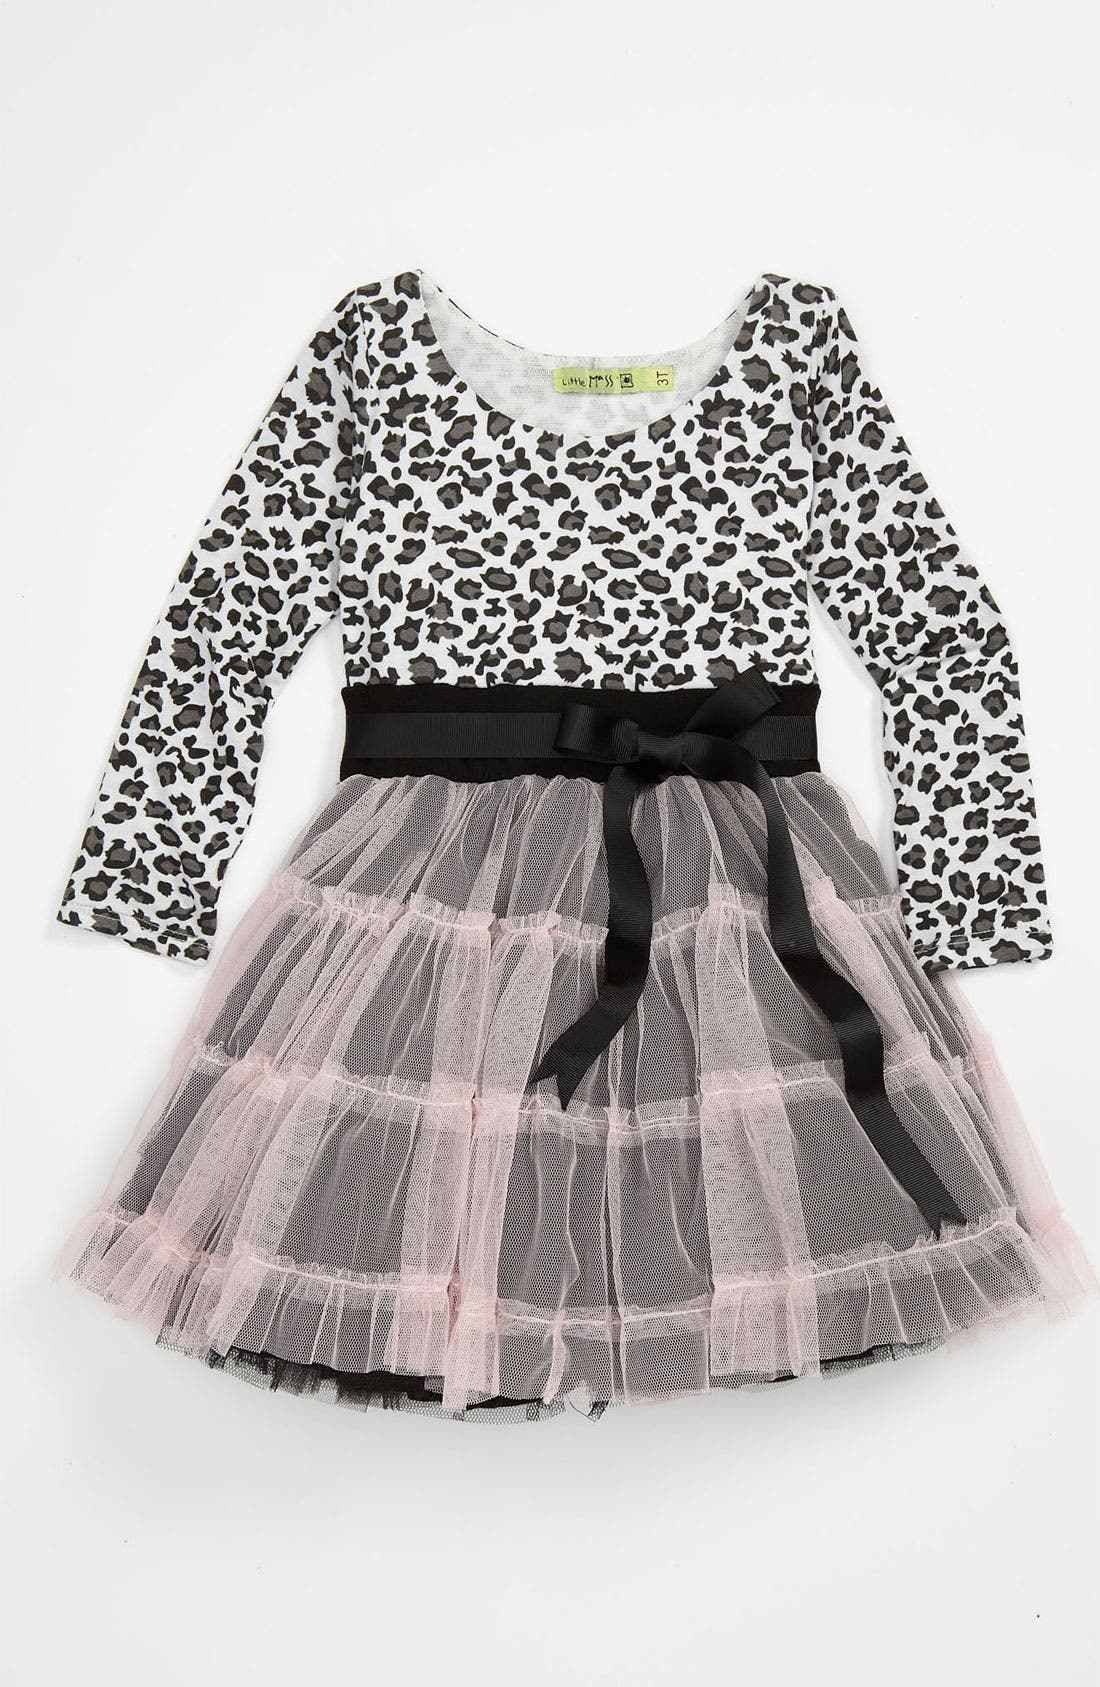 Main Image - Little Mass 'Le Petit Chat' Dress (Toddler)